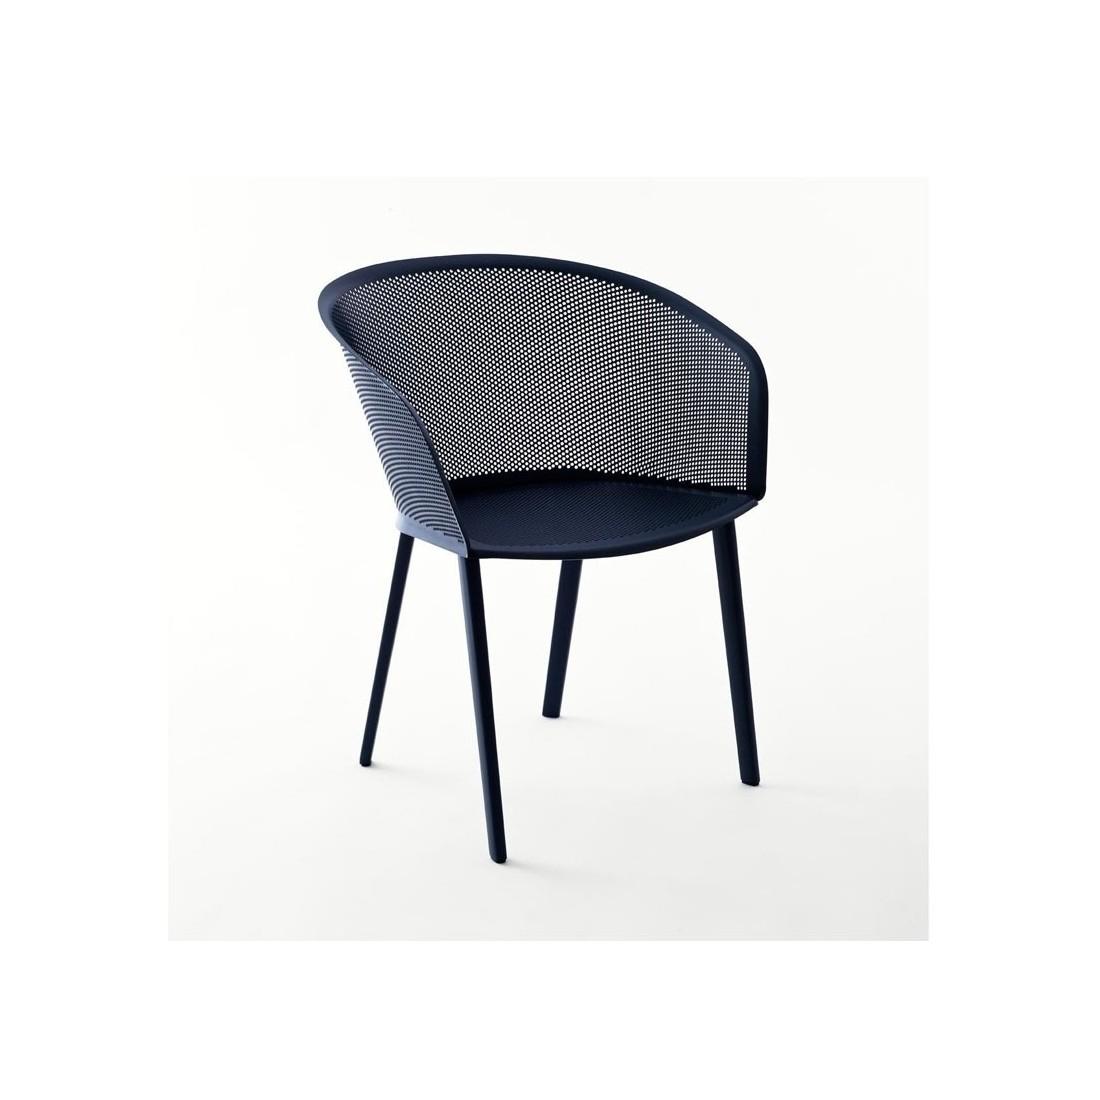 chaise de jardin avec accoudoirs stampa kettal kettal confort jardin couleur kettal craie. Black Bedroom Furniture Sets. Home Design Ideas